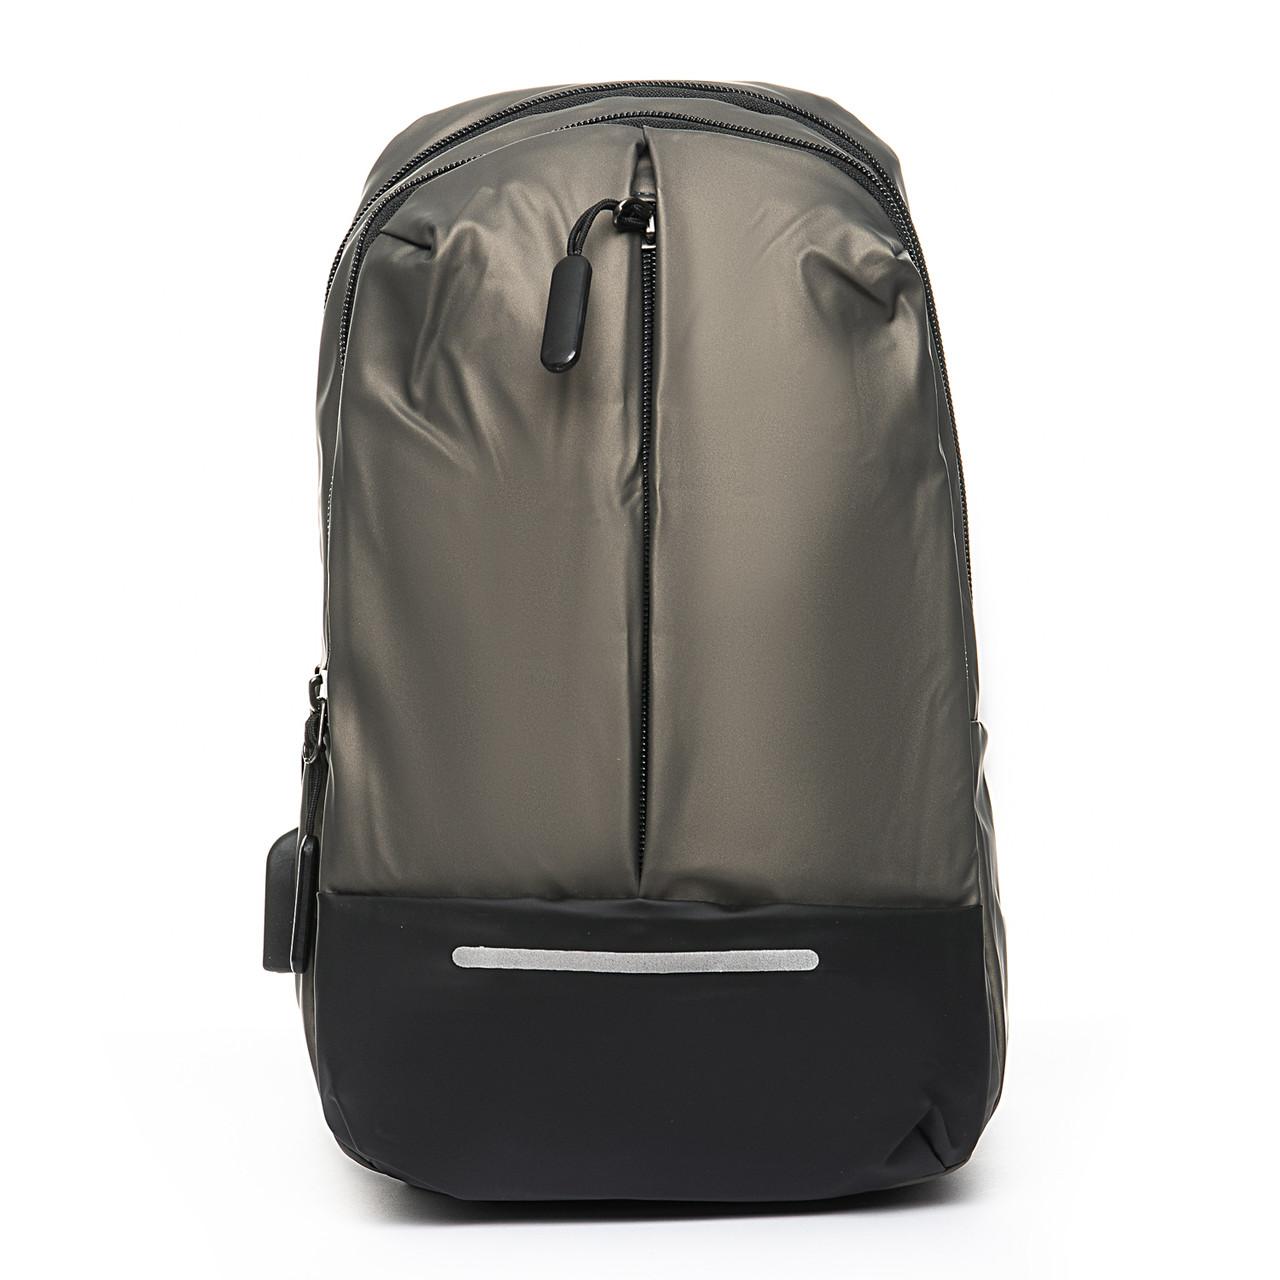 Мужская сумка через плече Lanpad 18 x 32 x 10 см Золотой (4066/4)